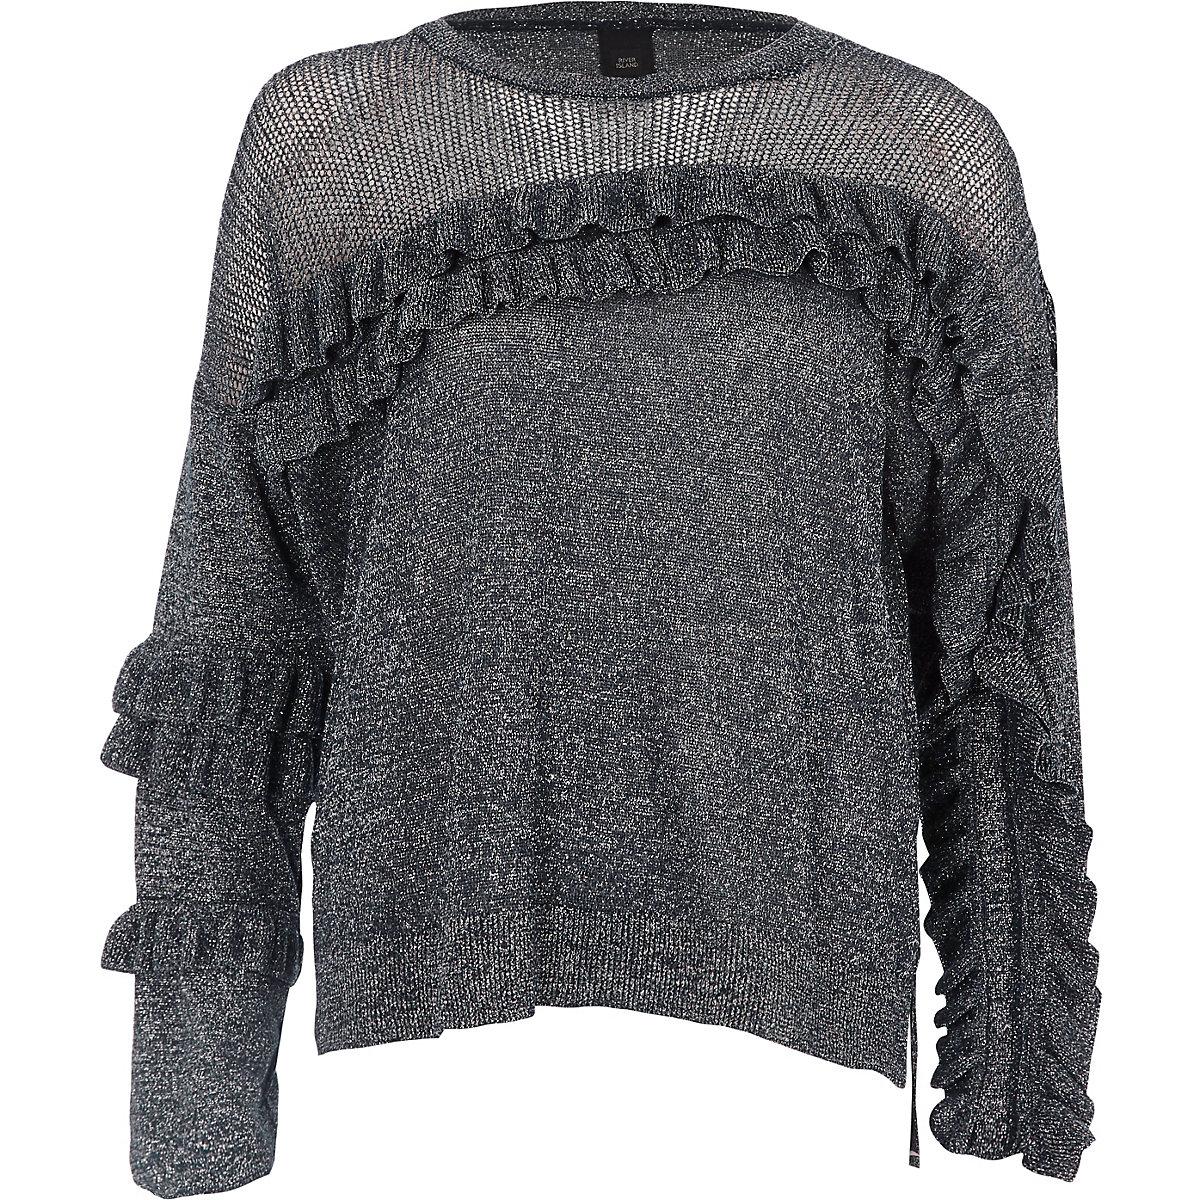 Dark silver metallic knit frill front jumper